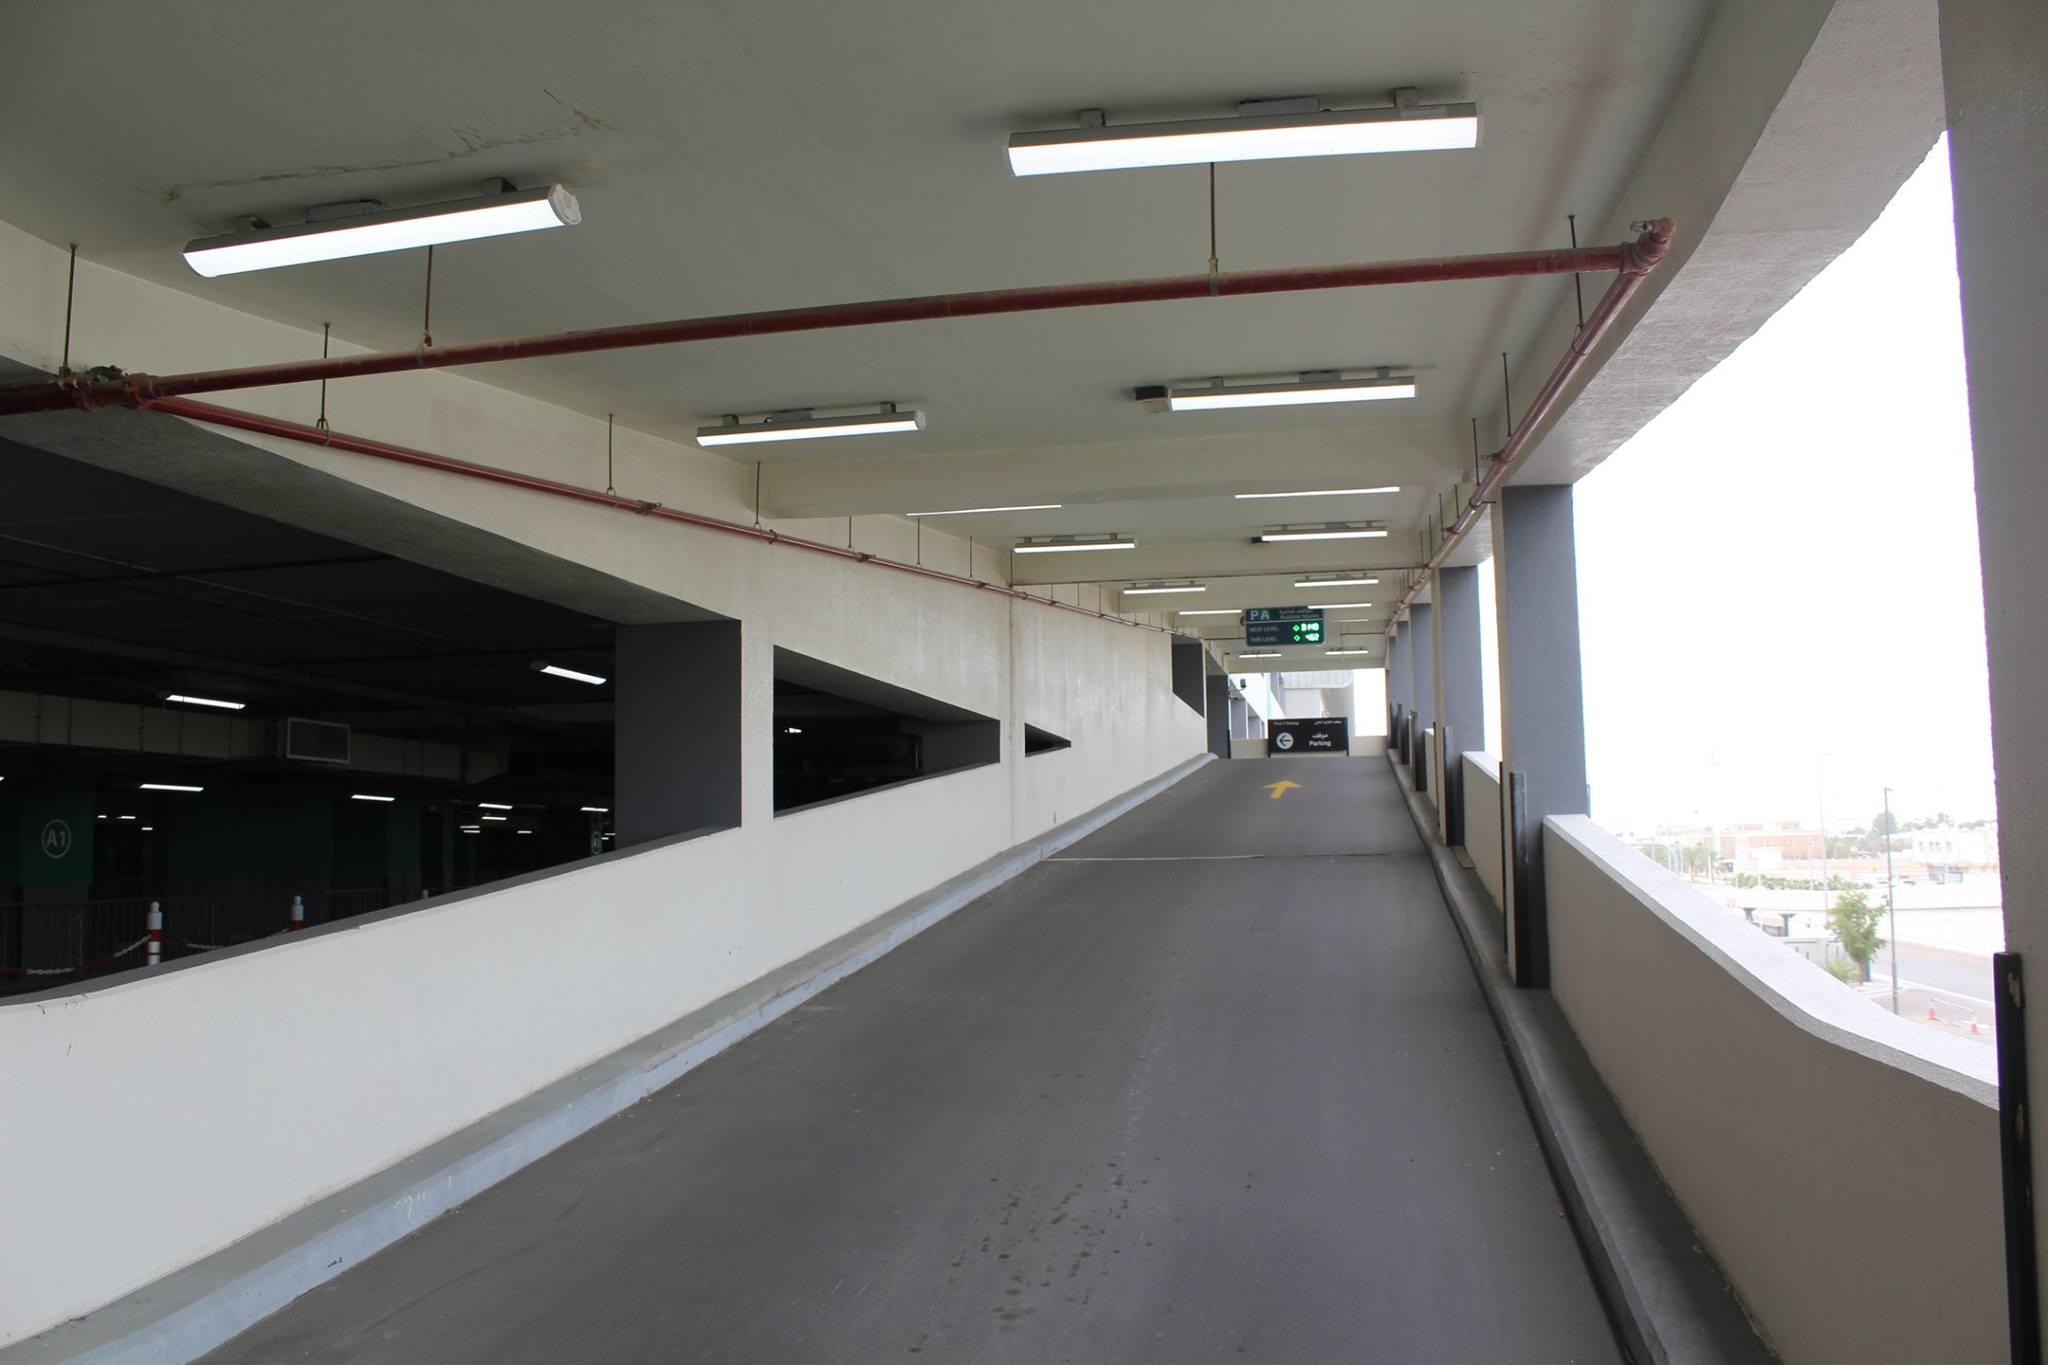 projecteur-SORA-eclairage-industriel